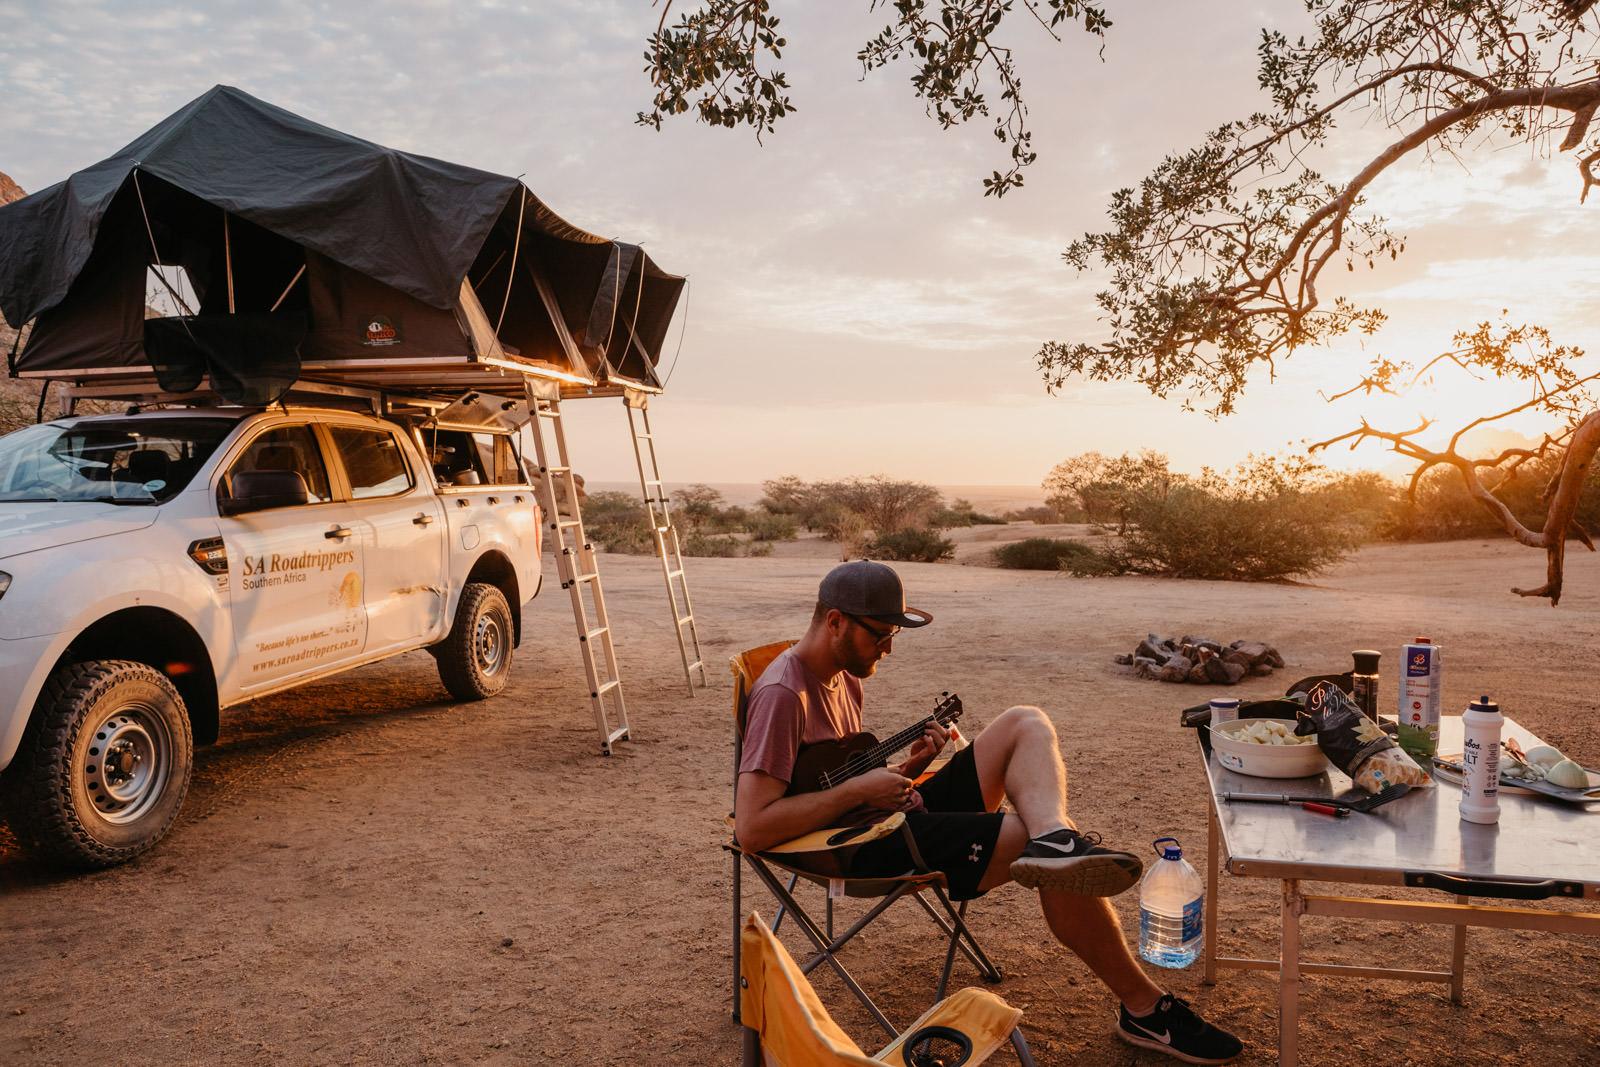 namibia_trip_rooftent_camping_roadtrip (11 von 18).jpg